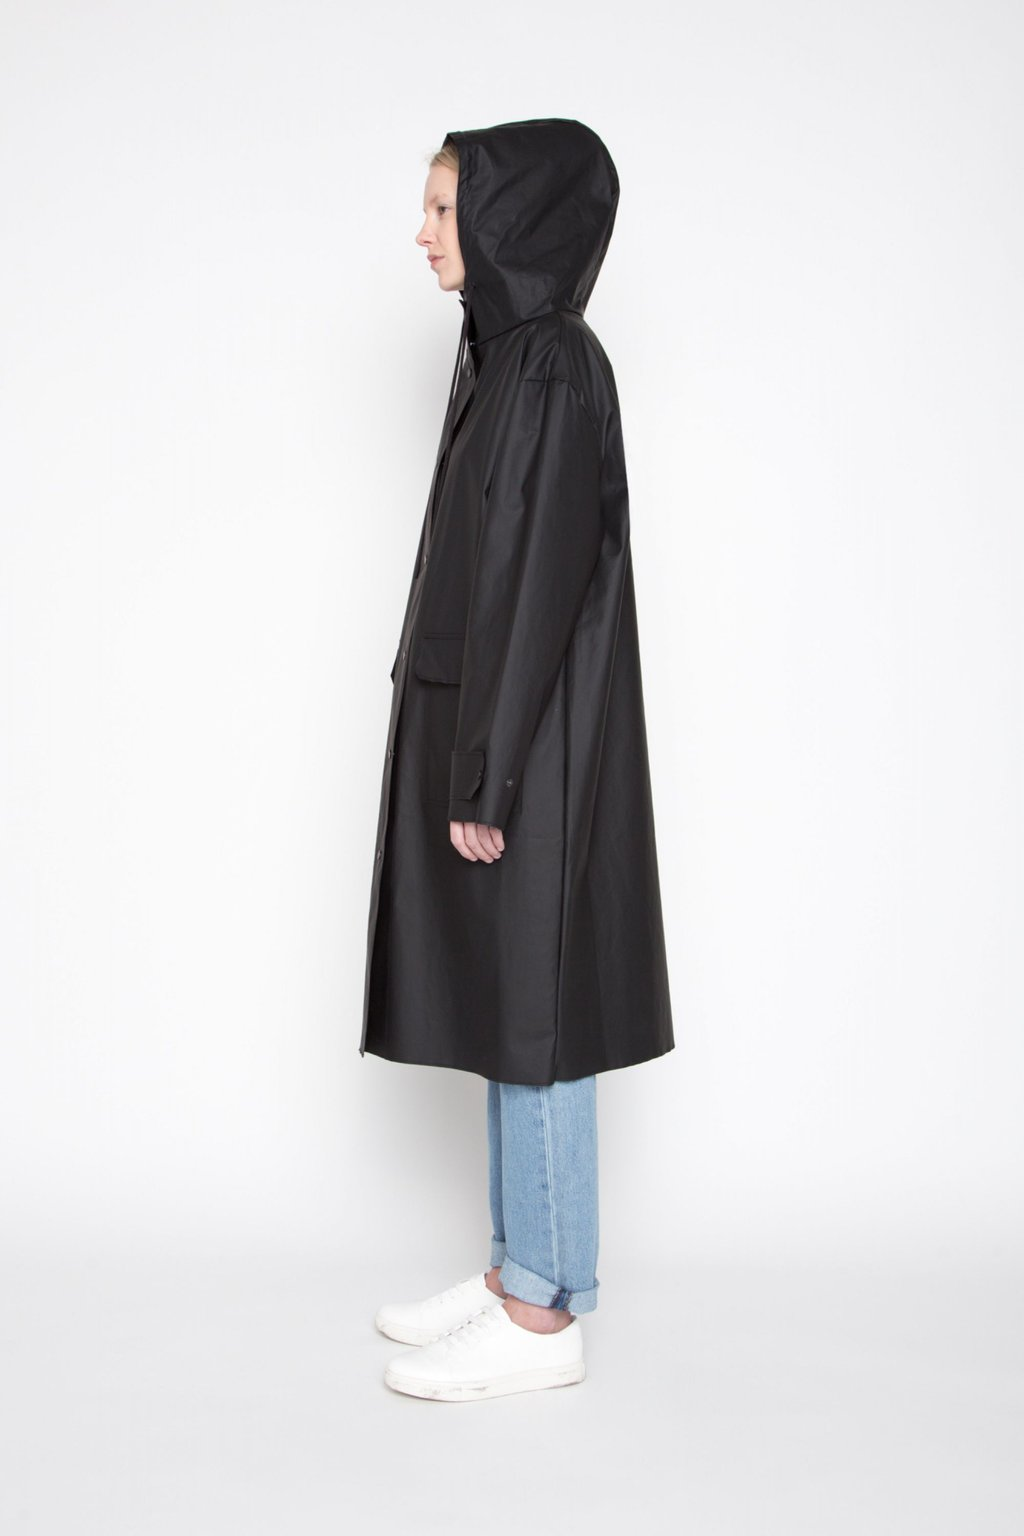 Rain Coat 1062 Black 3